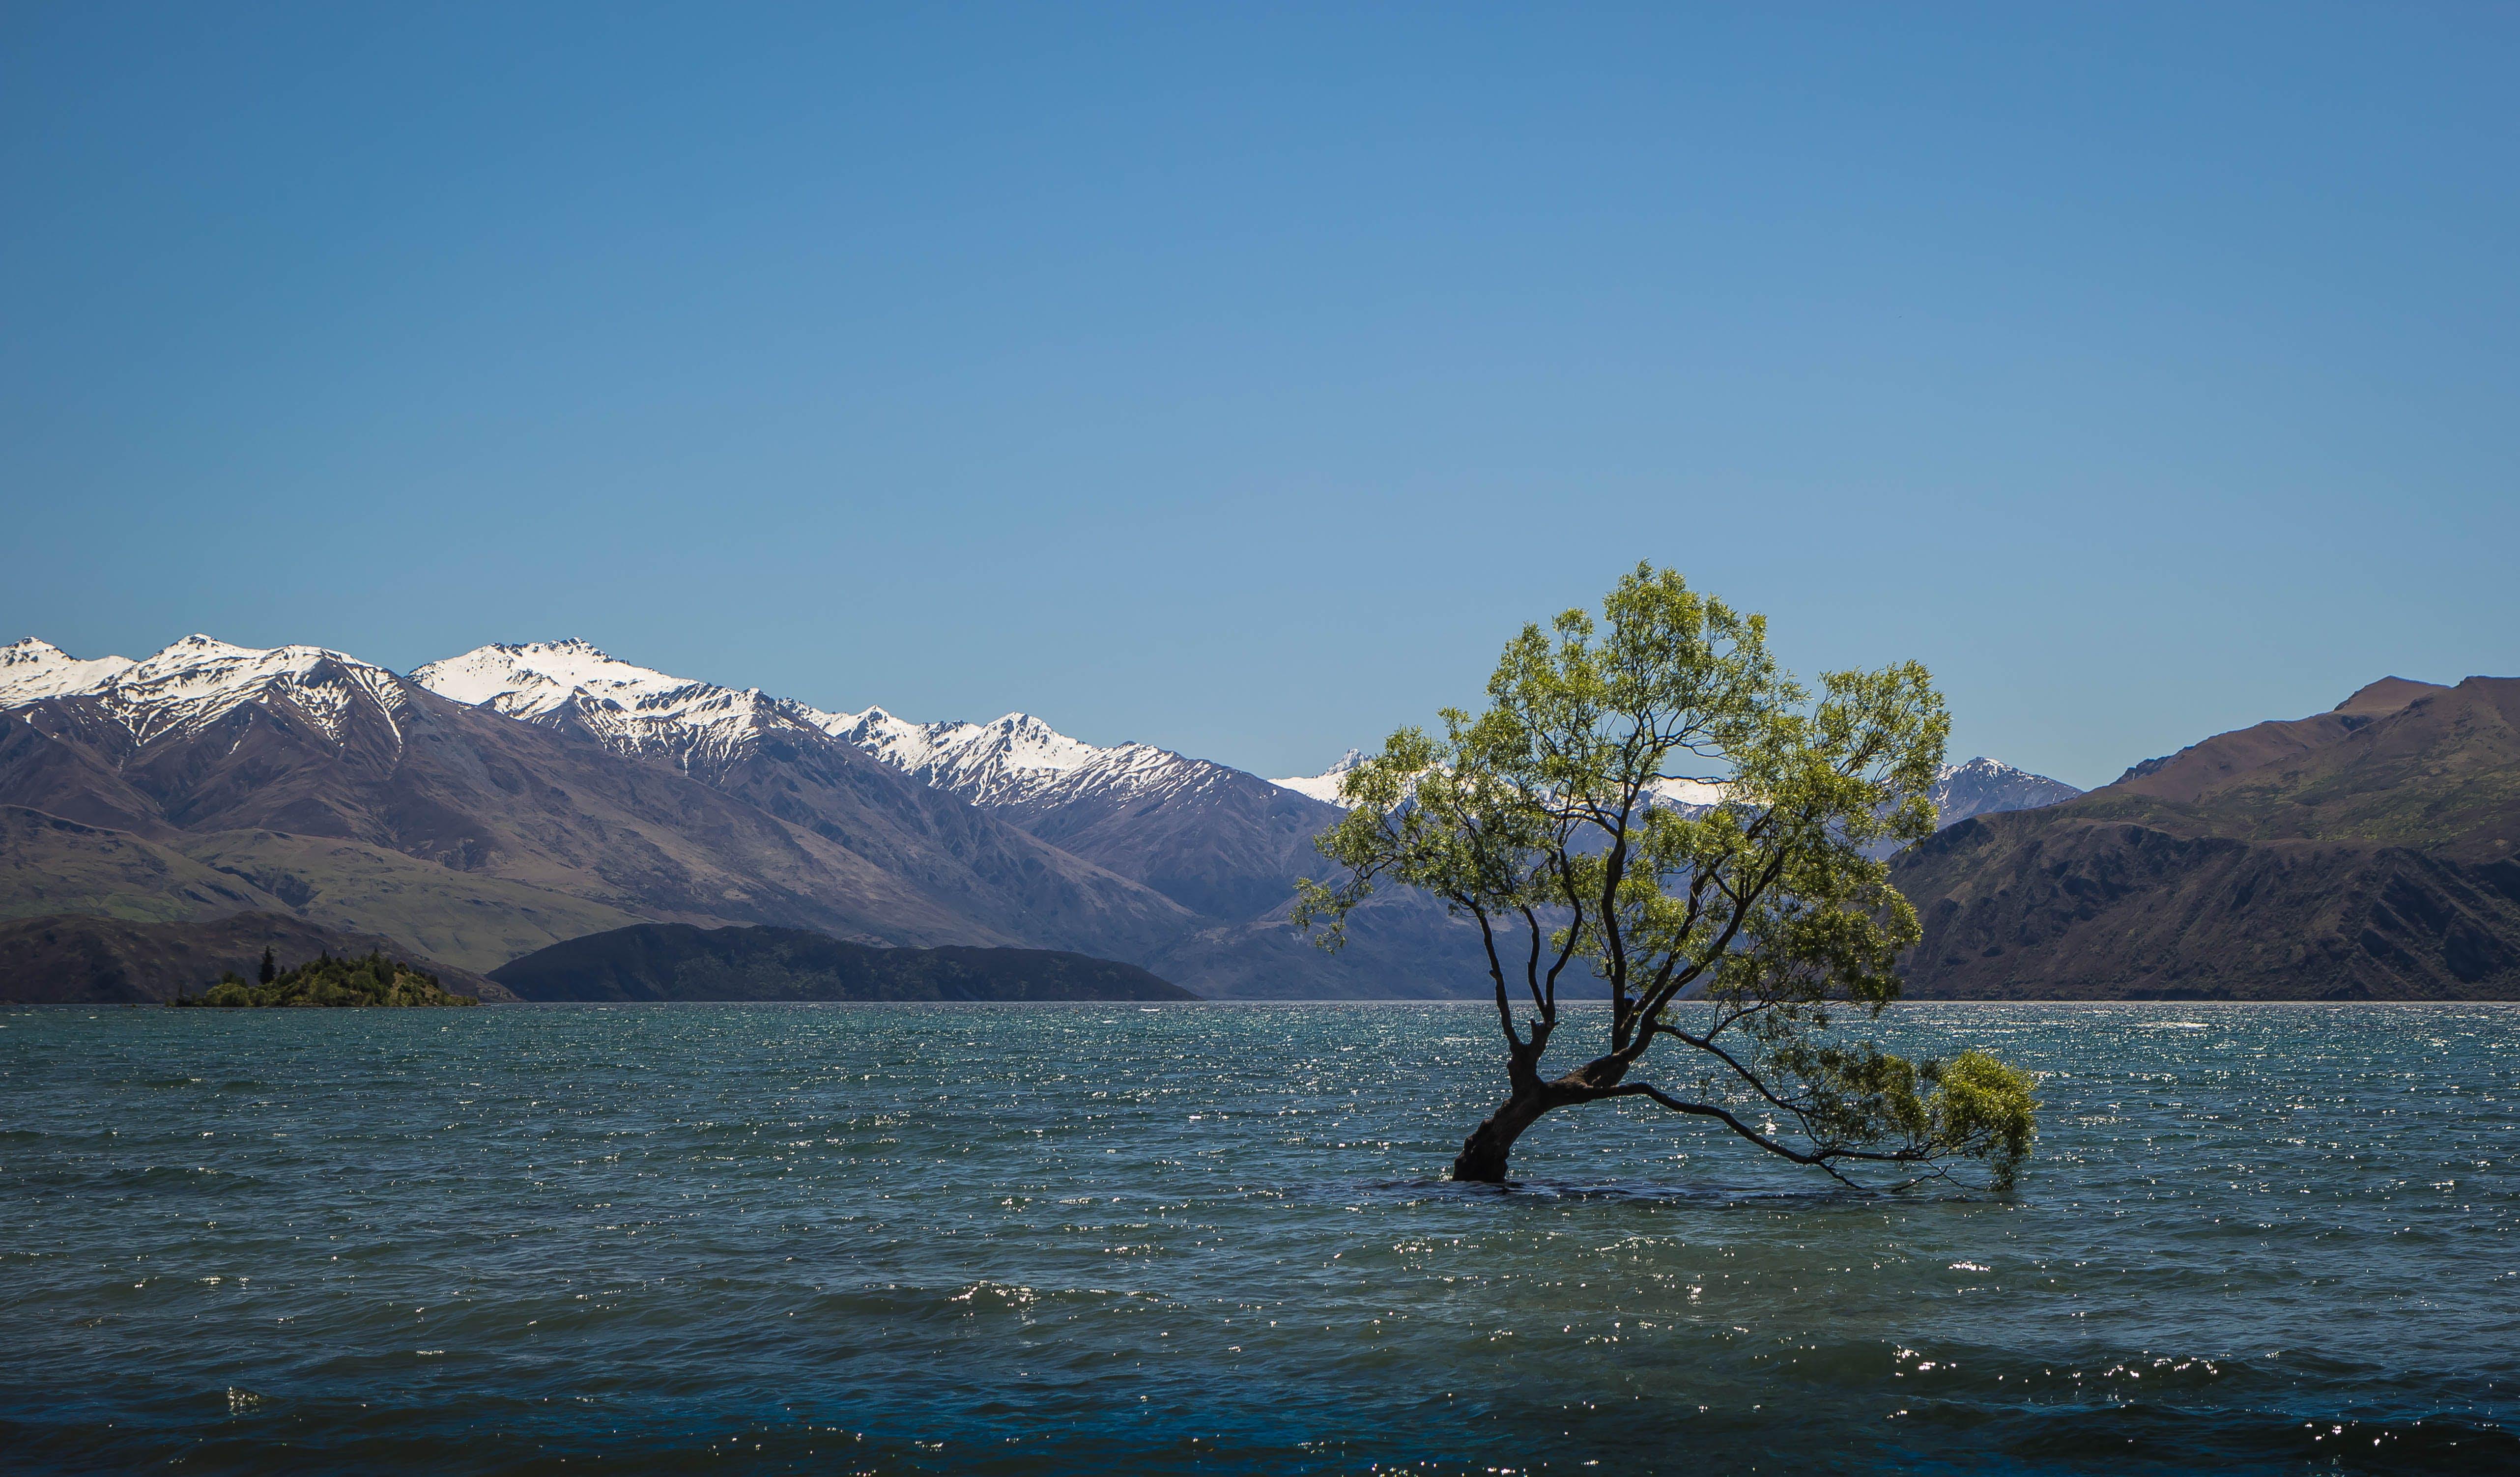 Free stock photo of mountains, lake, new zealand, wanaka tree